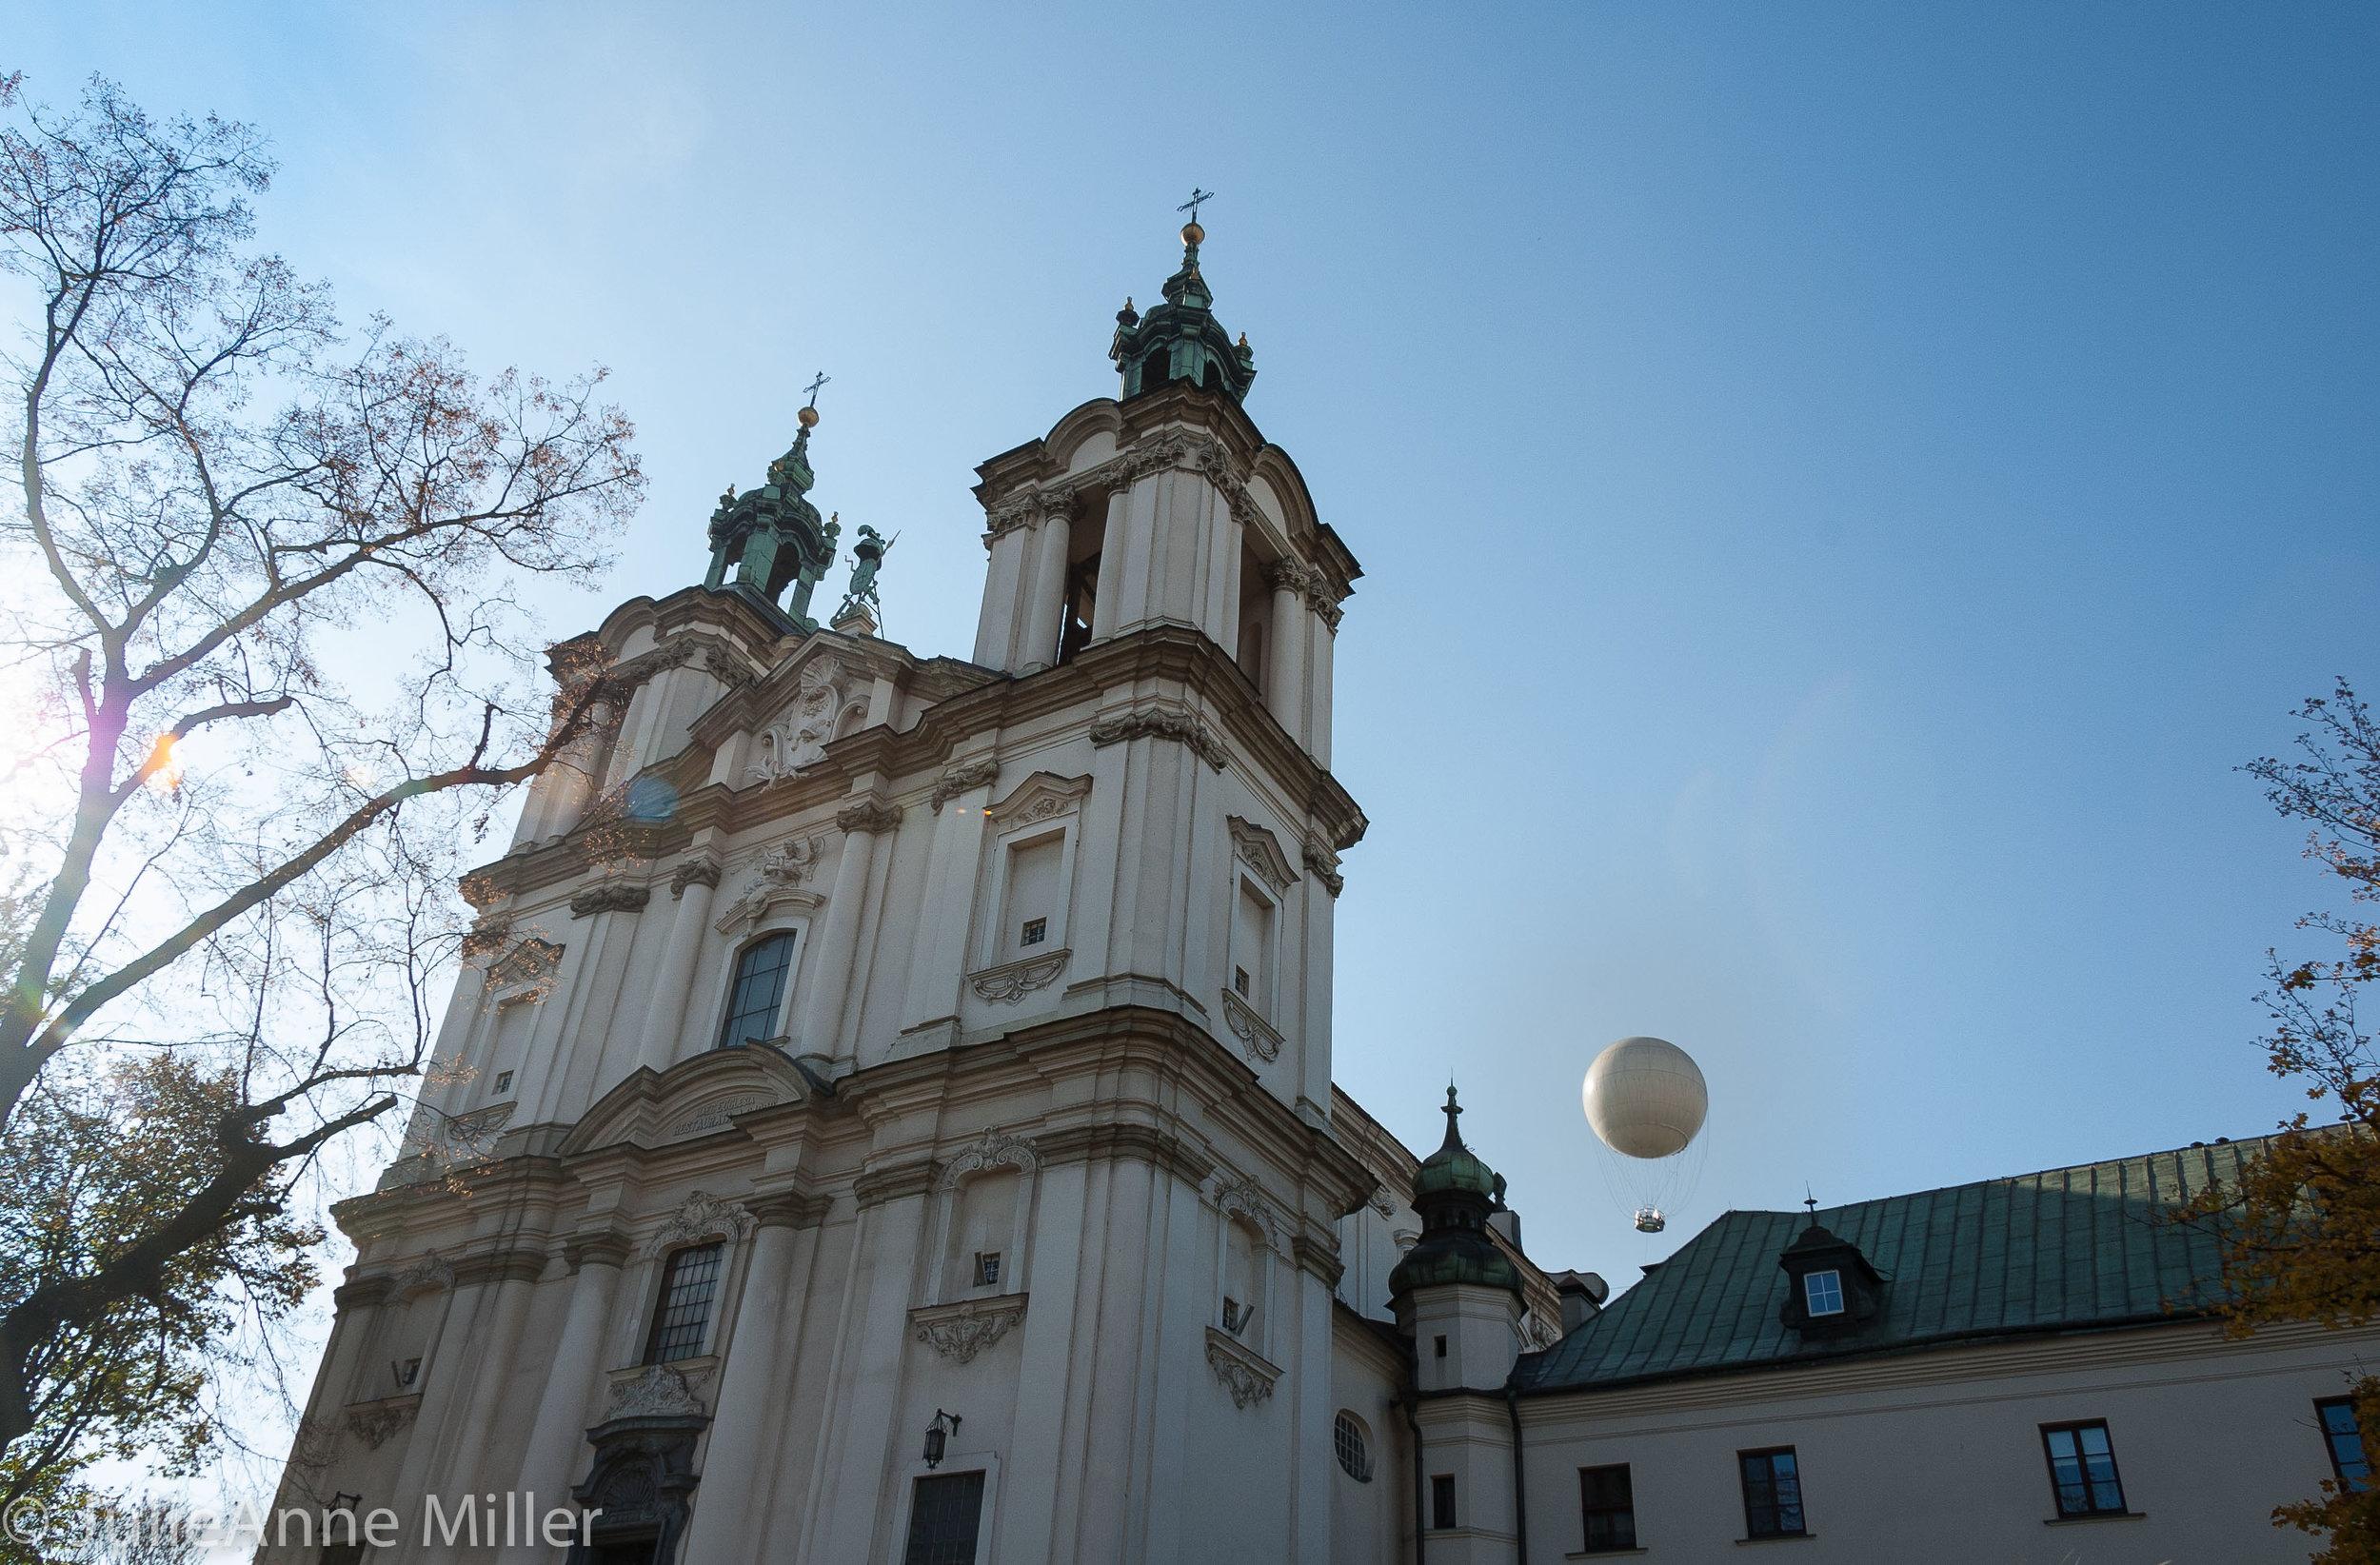 krakow church 2.jpg